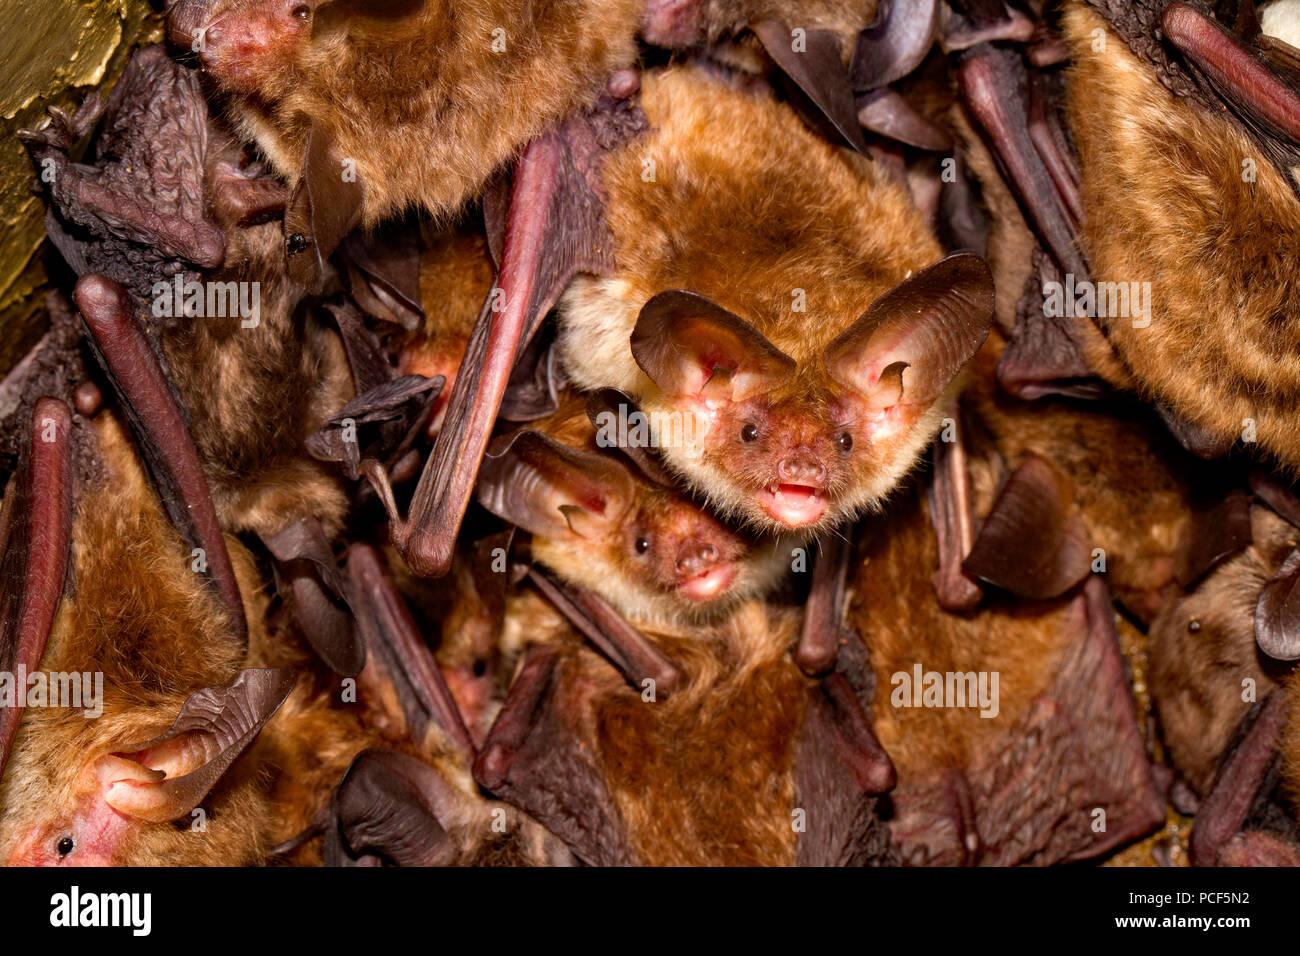 Bechstein di pipistrelli, (Myotis bechsteinii) Immagini Stock